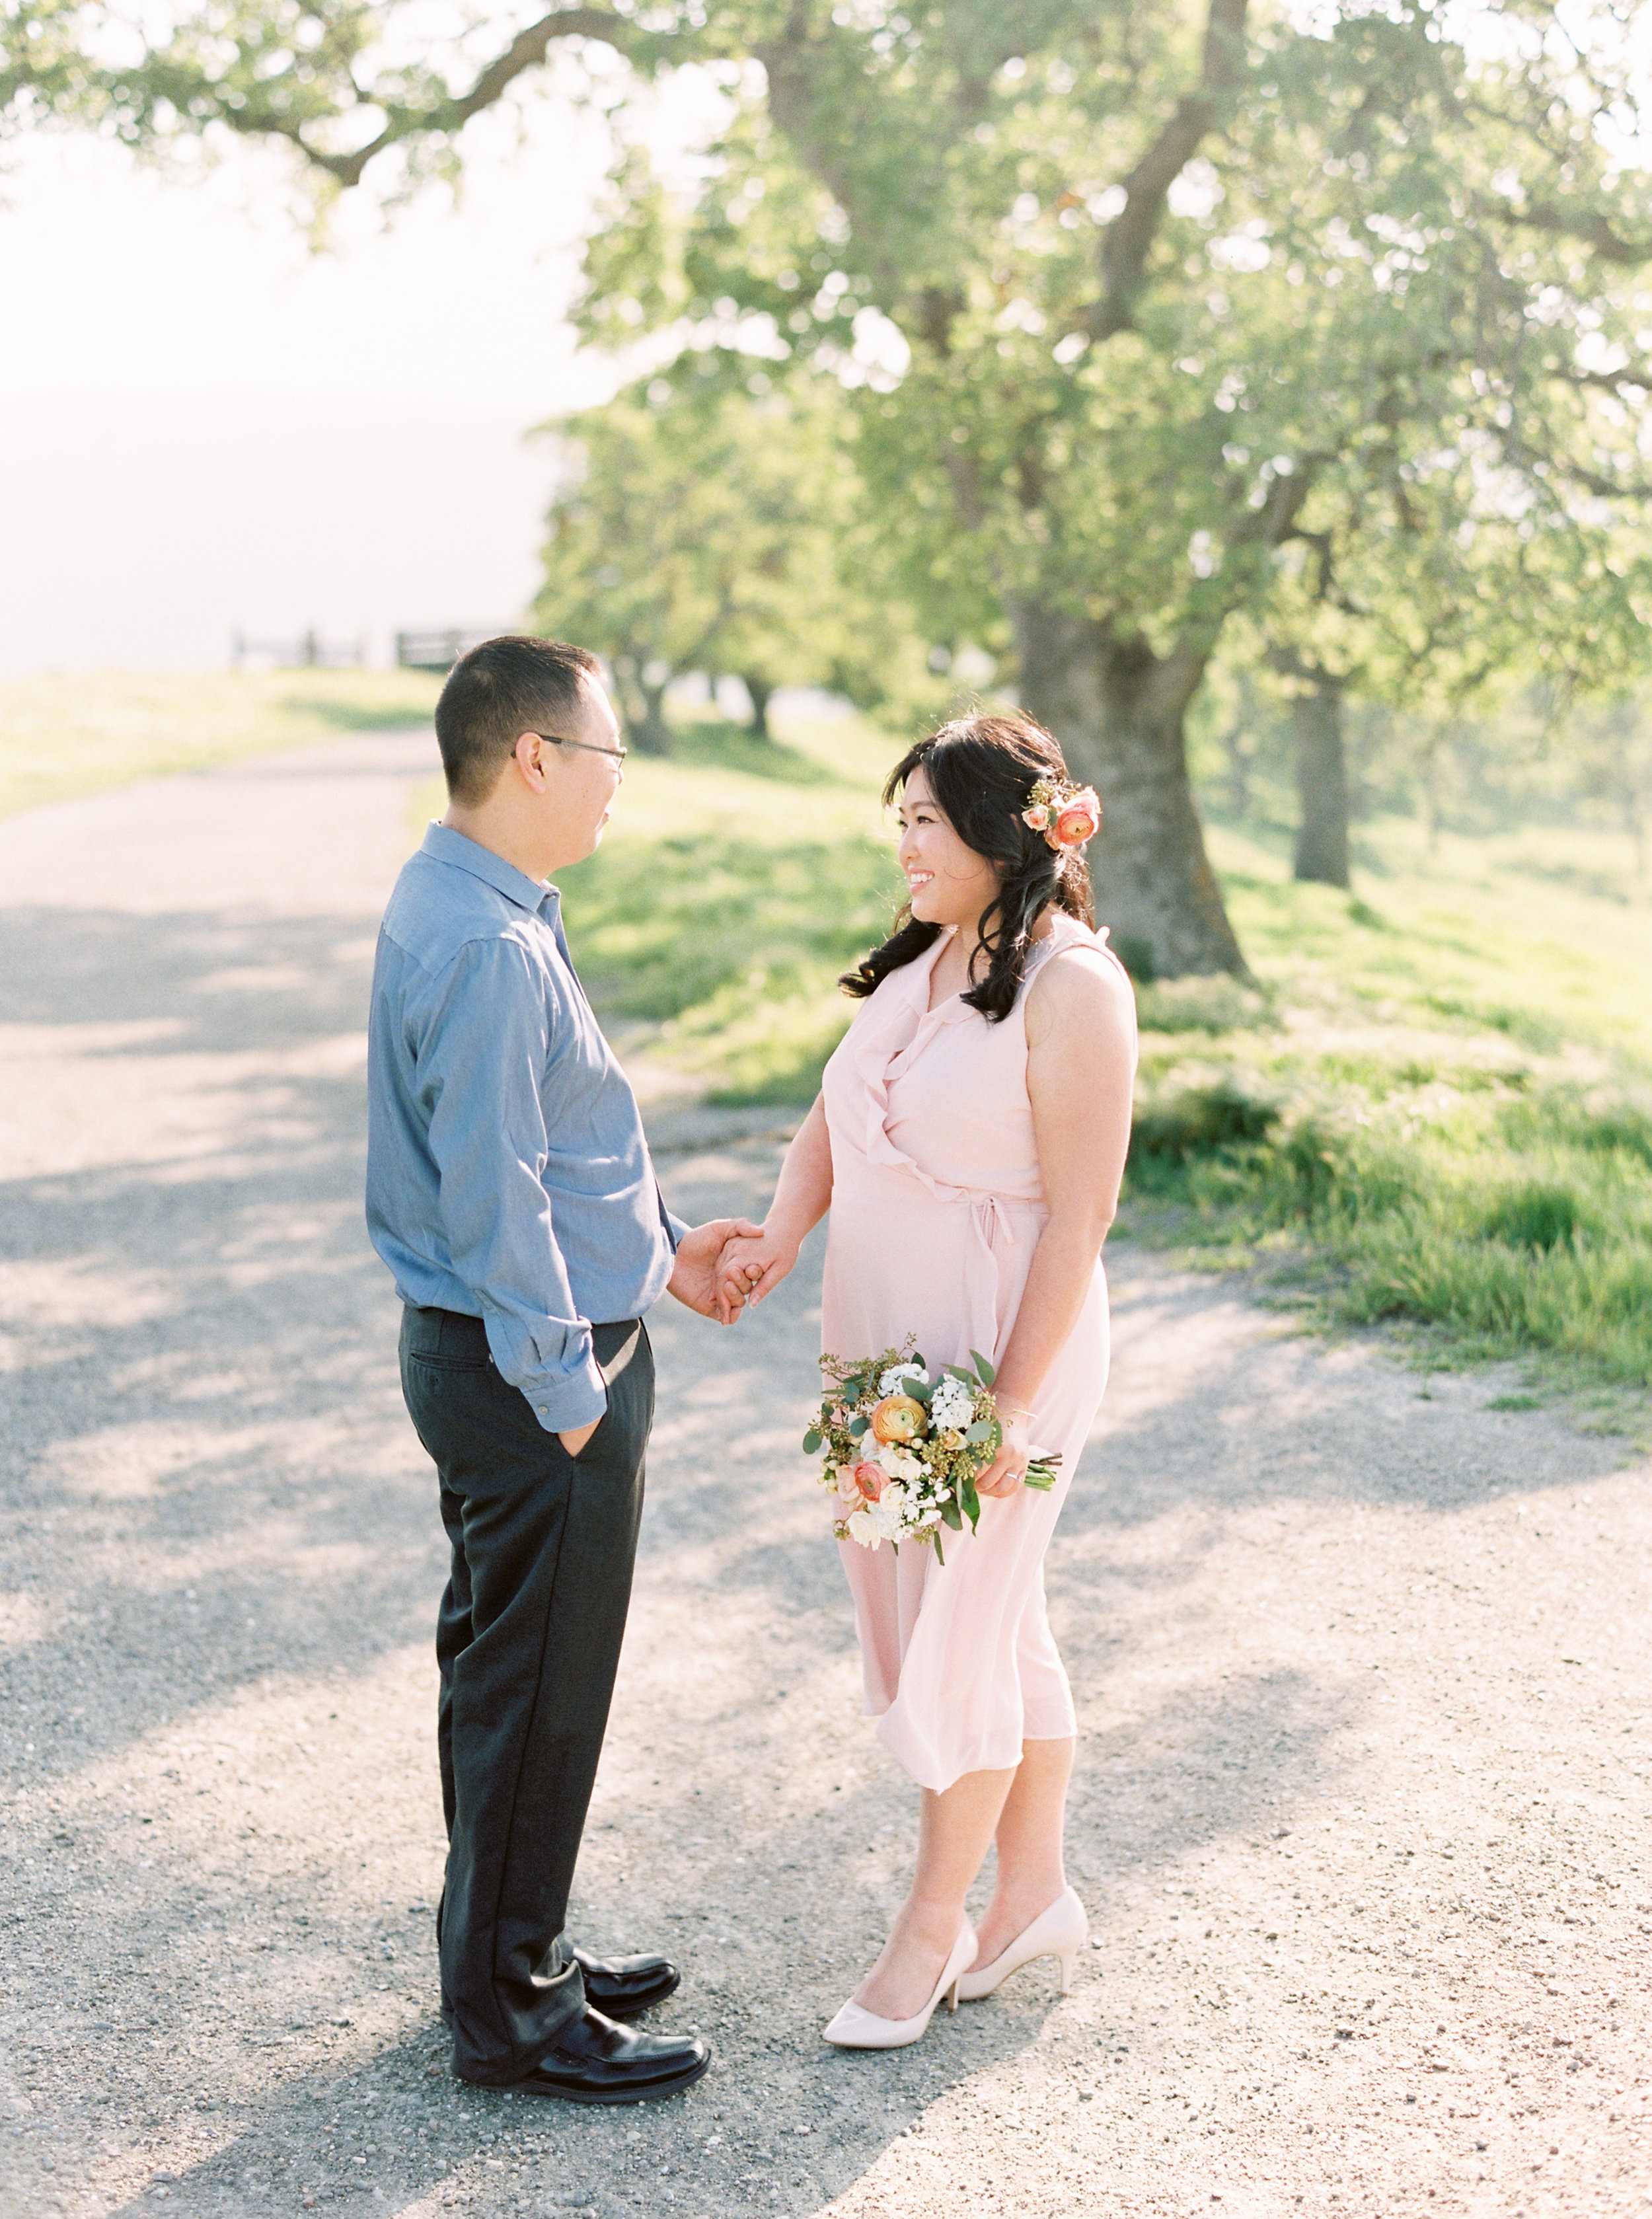 del-valle-livermore-bay-area-wedding-photographer-69.jpg